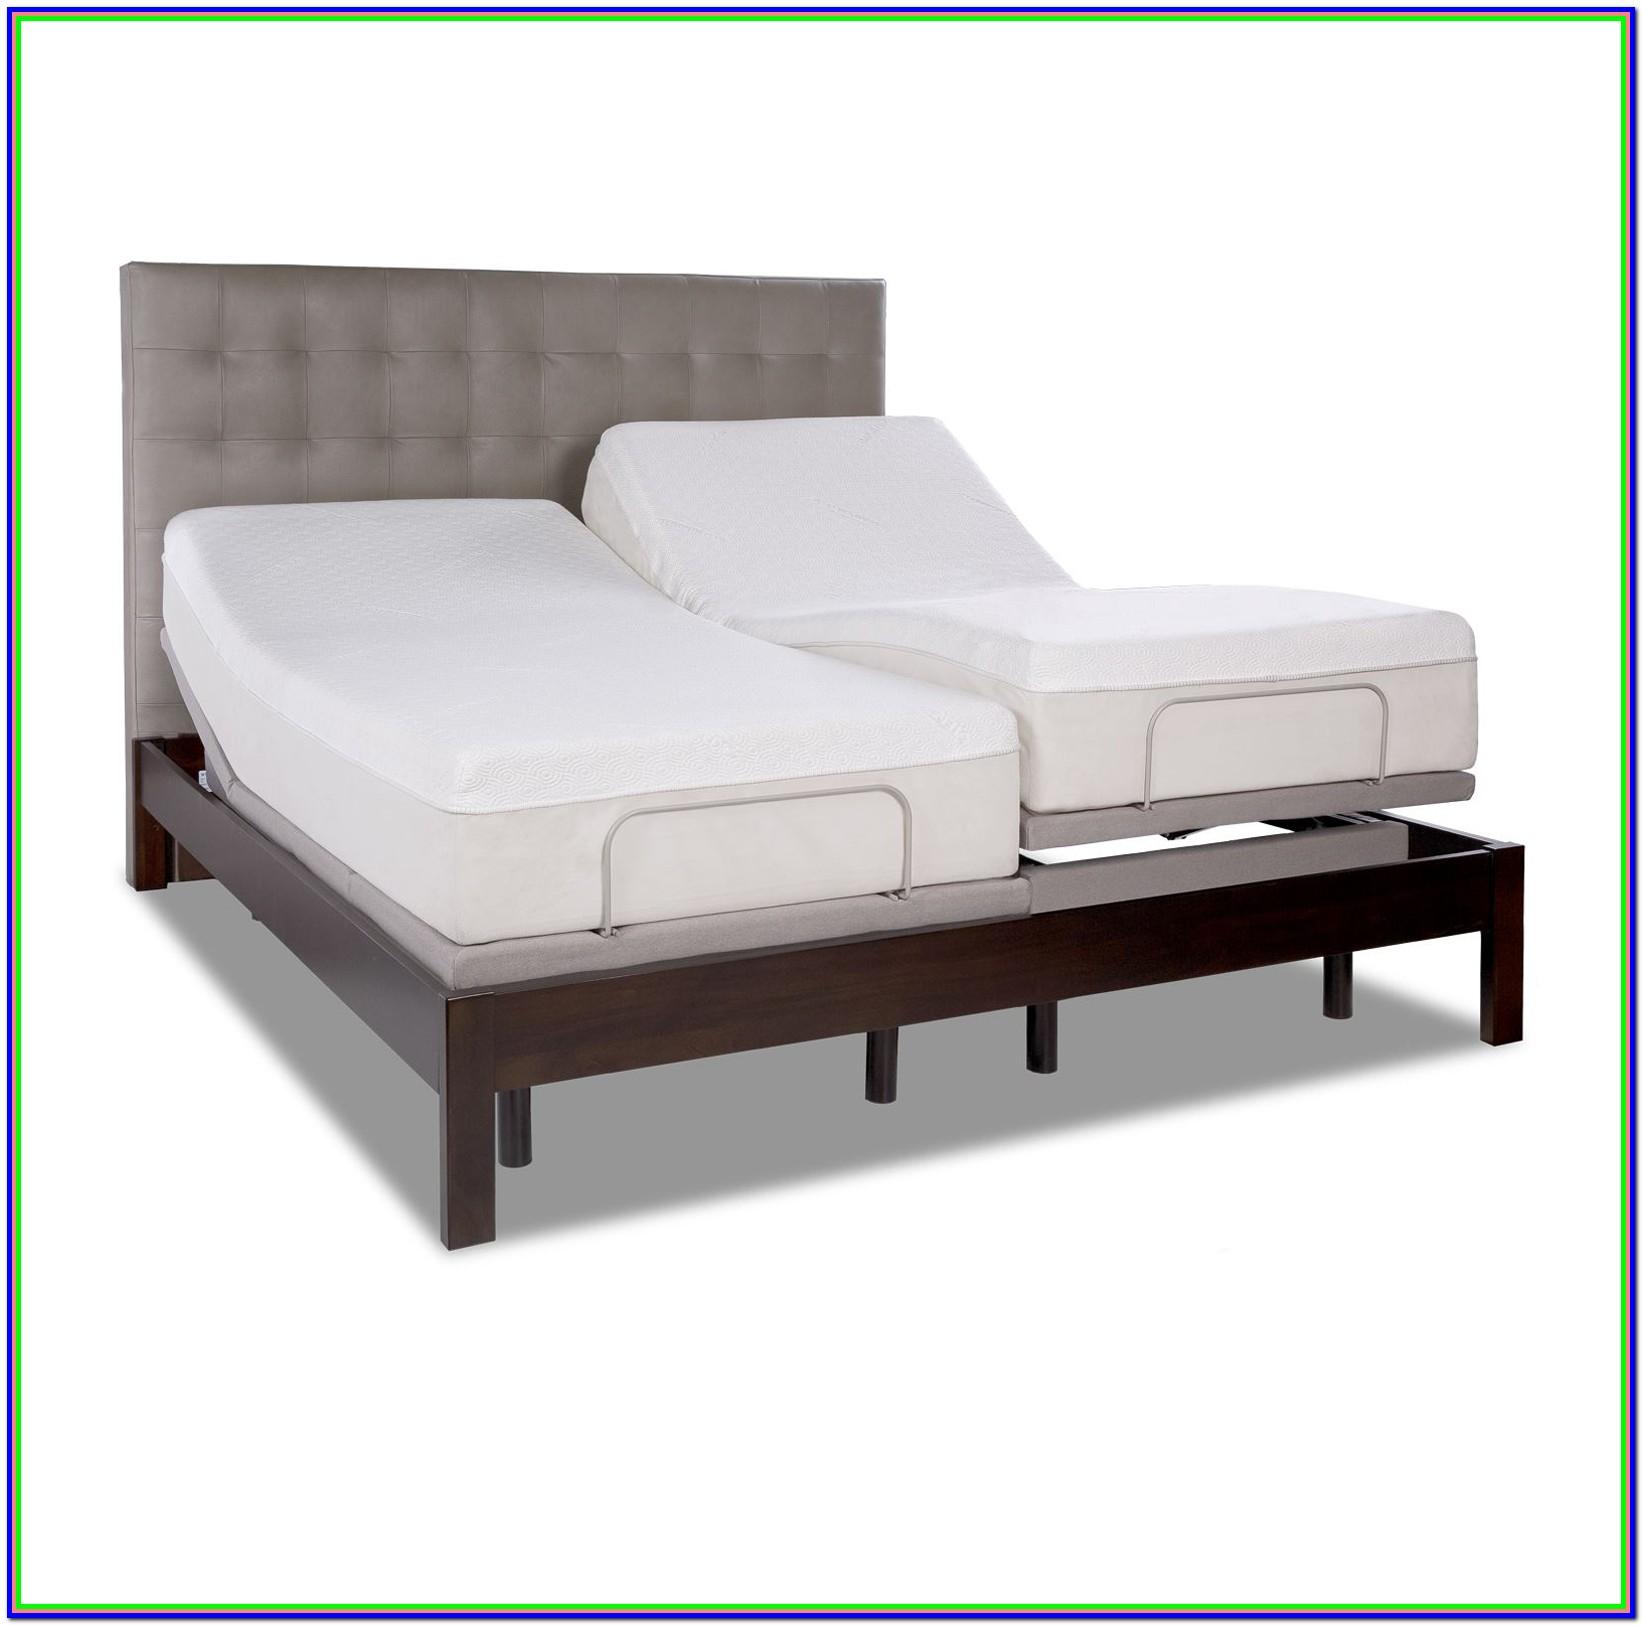 Tempur Pedic Queen Adjustable Bed Frame Advanced Ergo